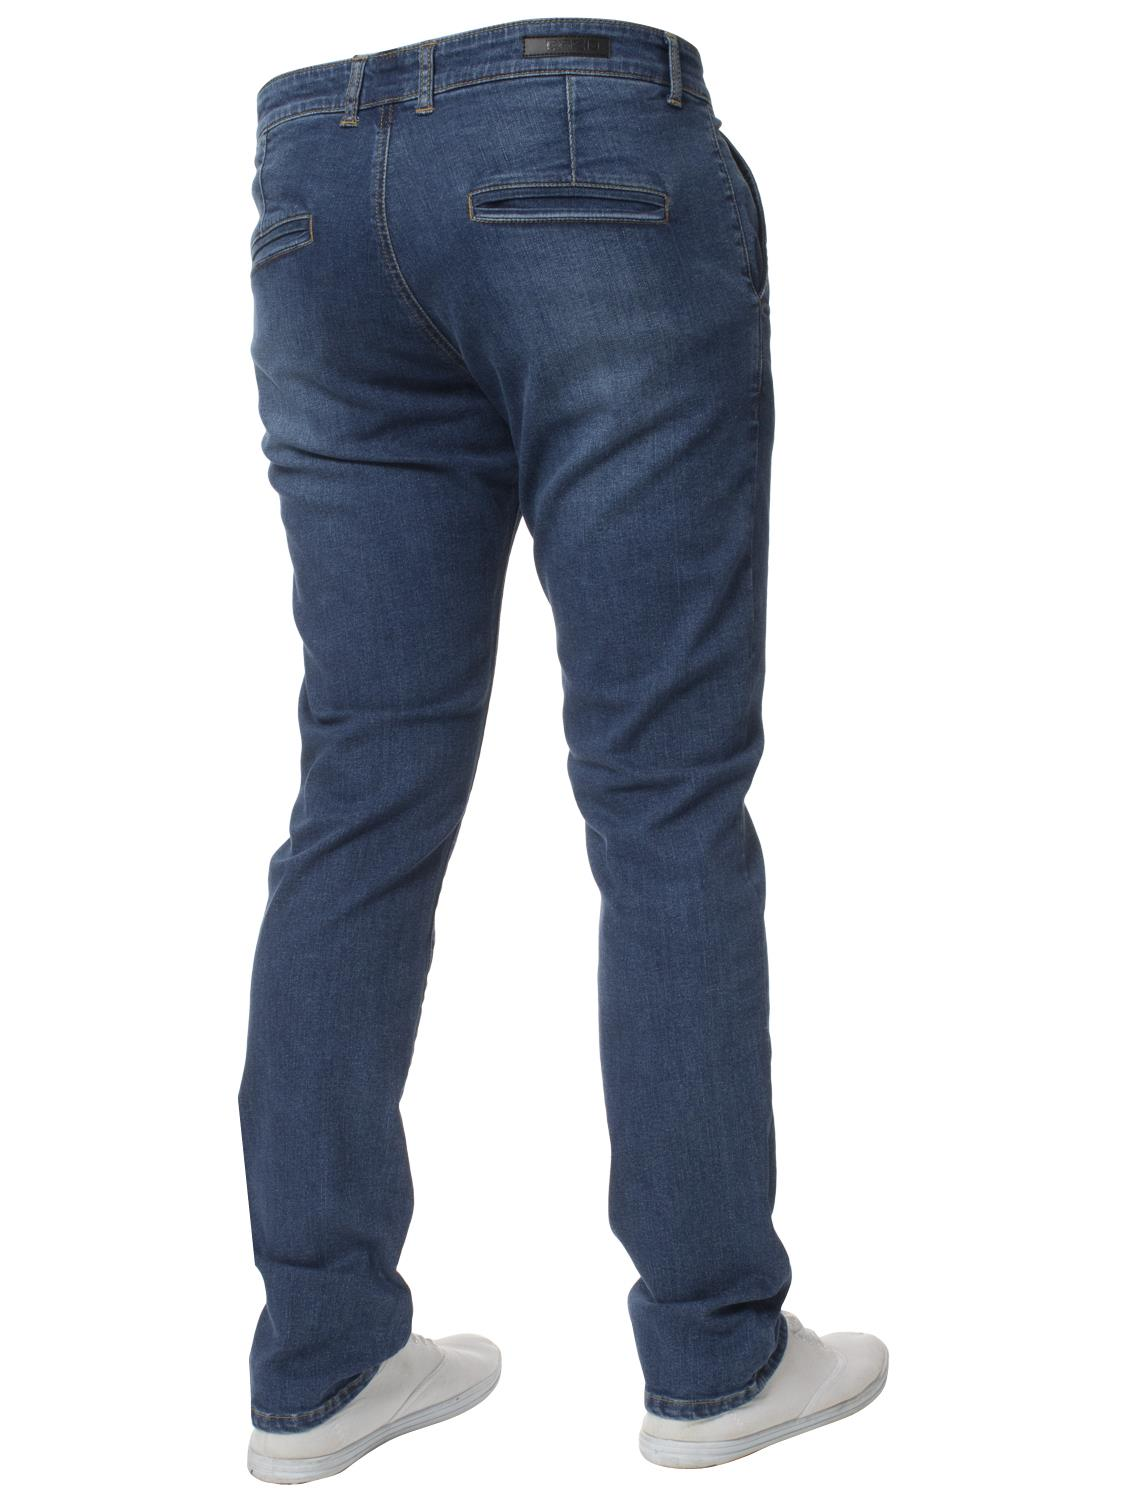 Enzo-Mens-Big-Tall-Jeans-Leg-King-Size-Denim-Pants-Chino-Trousers-Pants-44-034-60-034 thumbnail 35